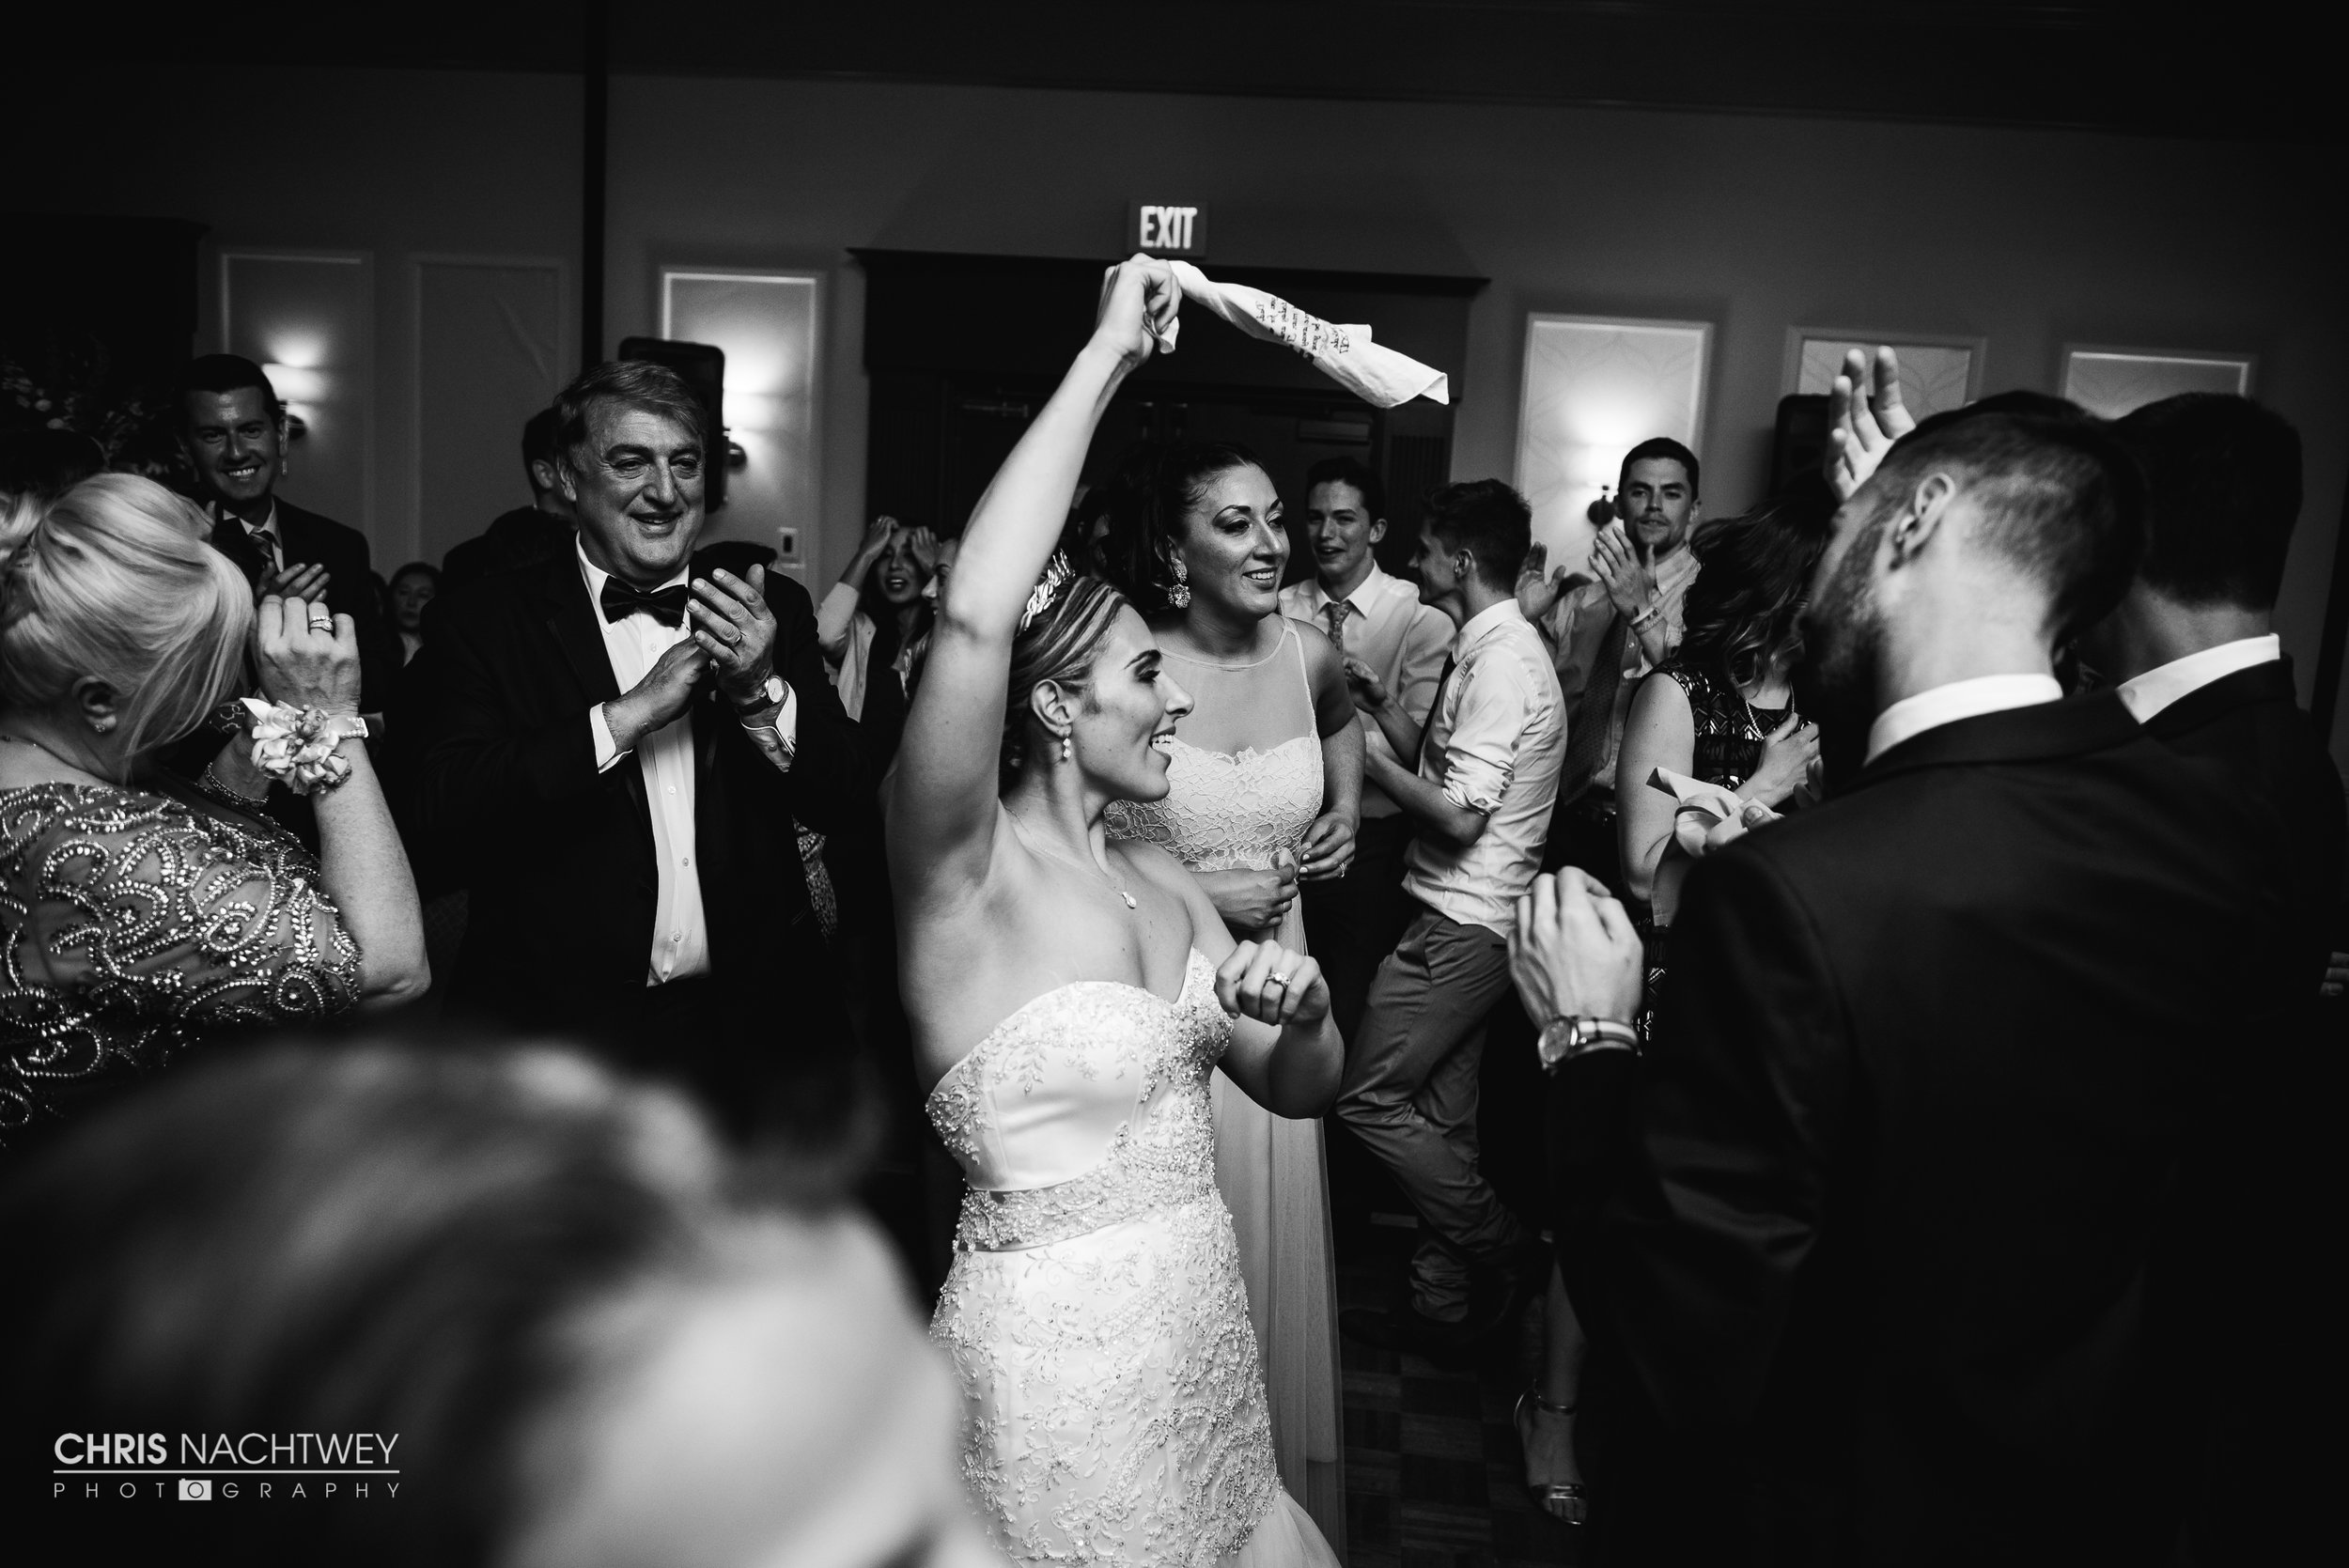 mystic-artistic-wedding-photographer-chris-nachtwey-2017-26.jpg